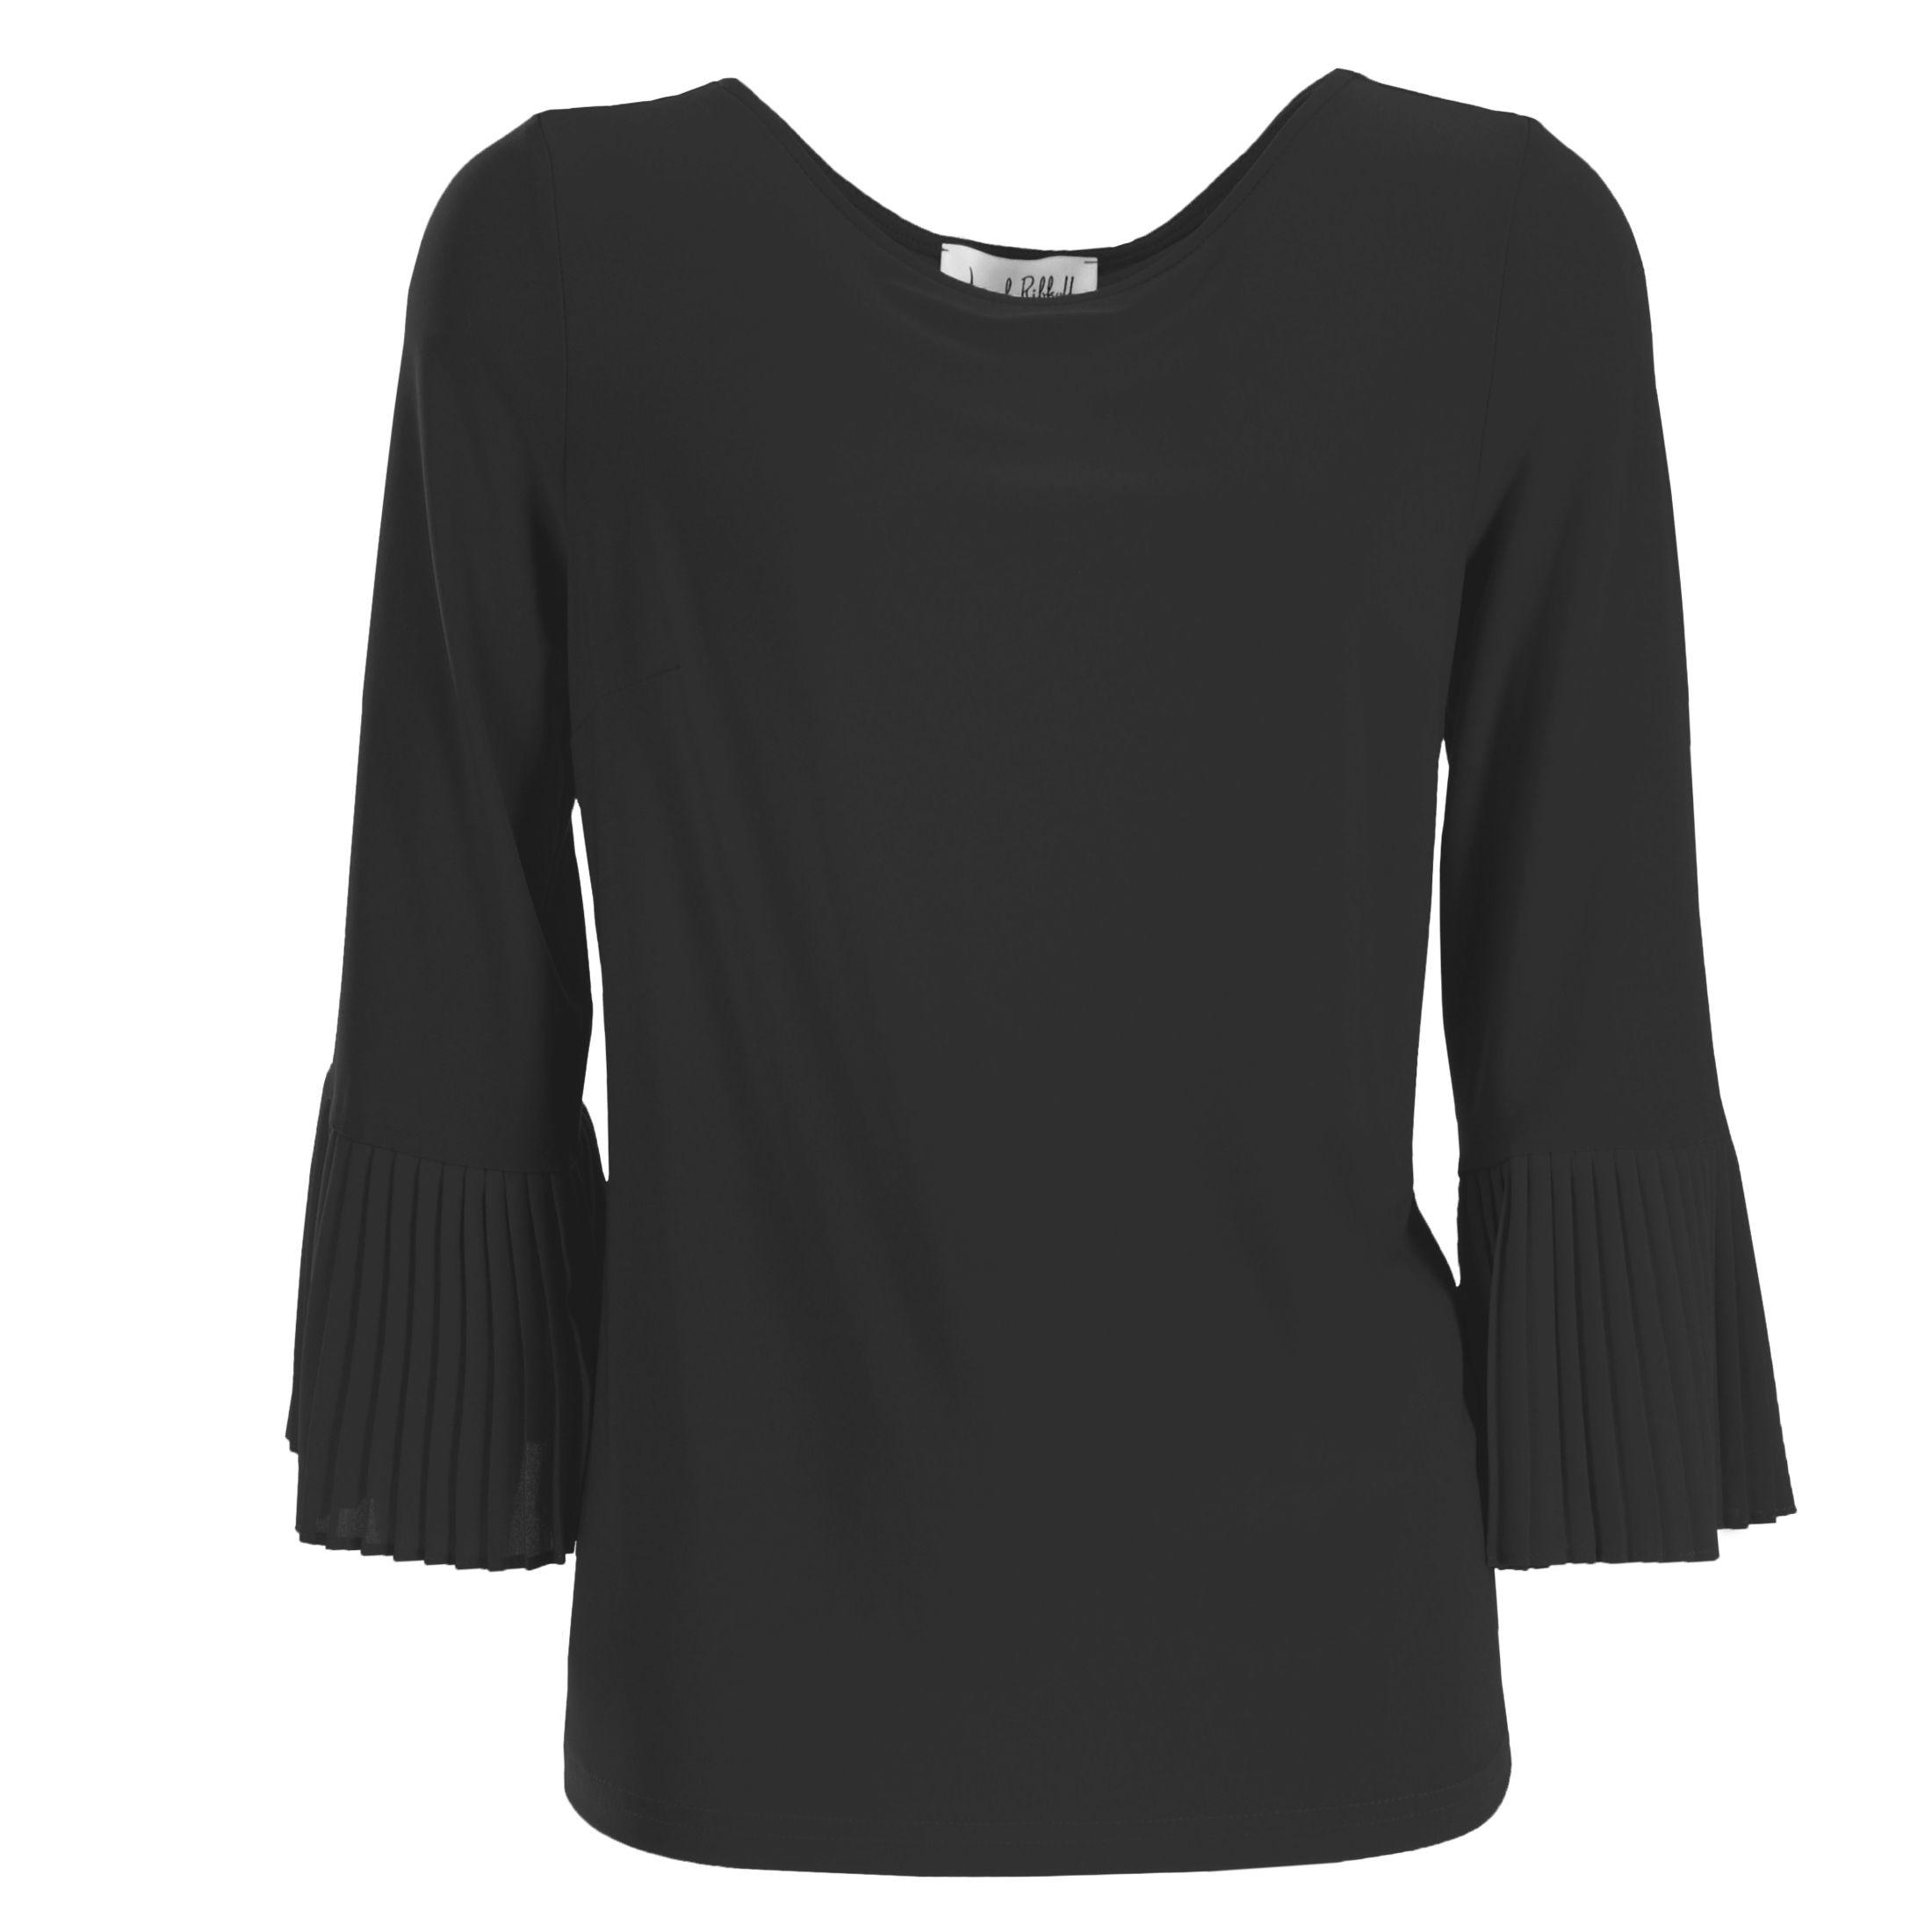 Joseph Black Ribkoff 11 Fb Cherise Shirt 183275 S0AngrS